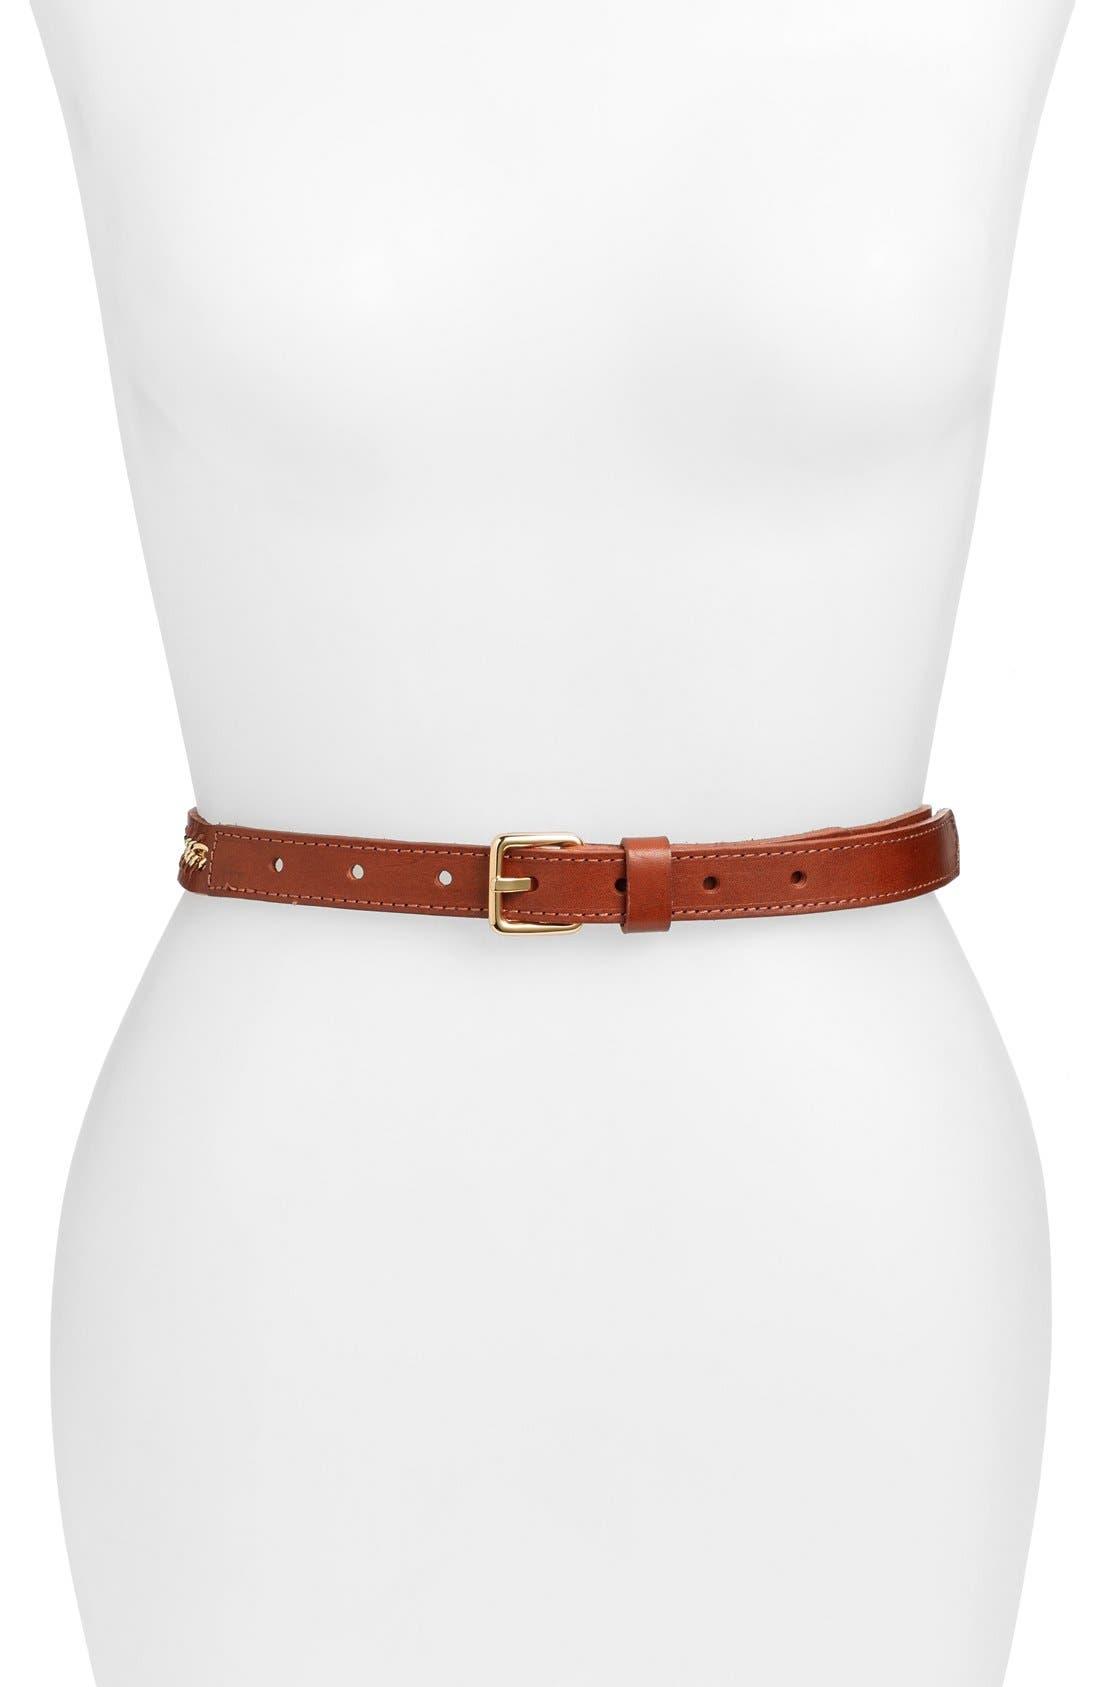 Rebecca Minkoff 'Gigi' Calfskin Leather Belt